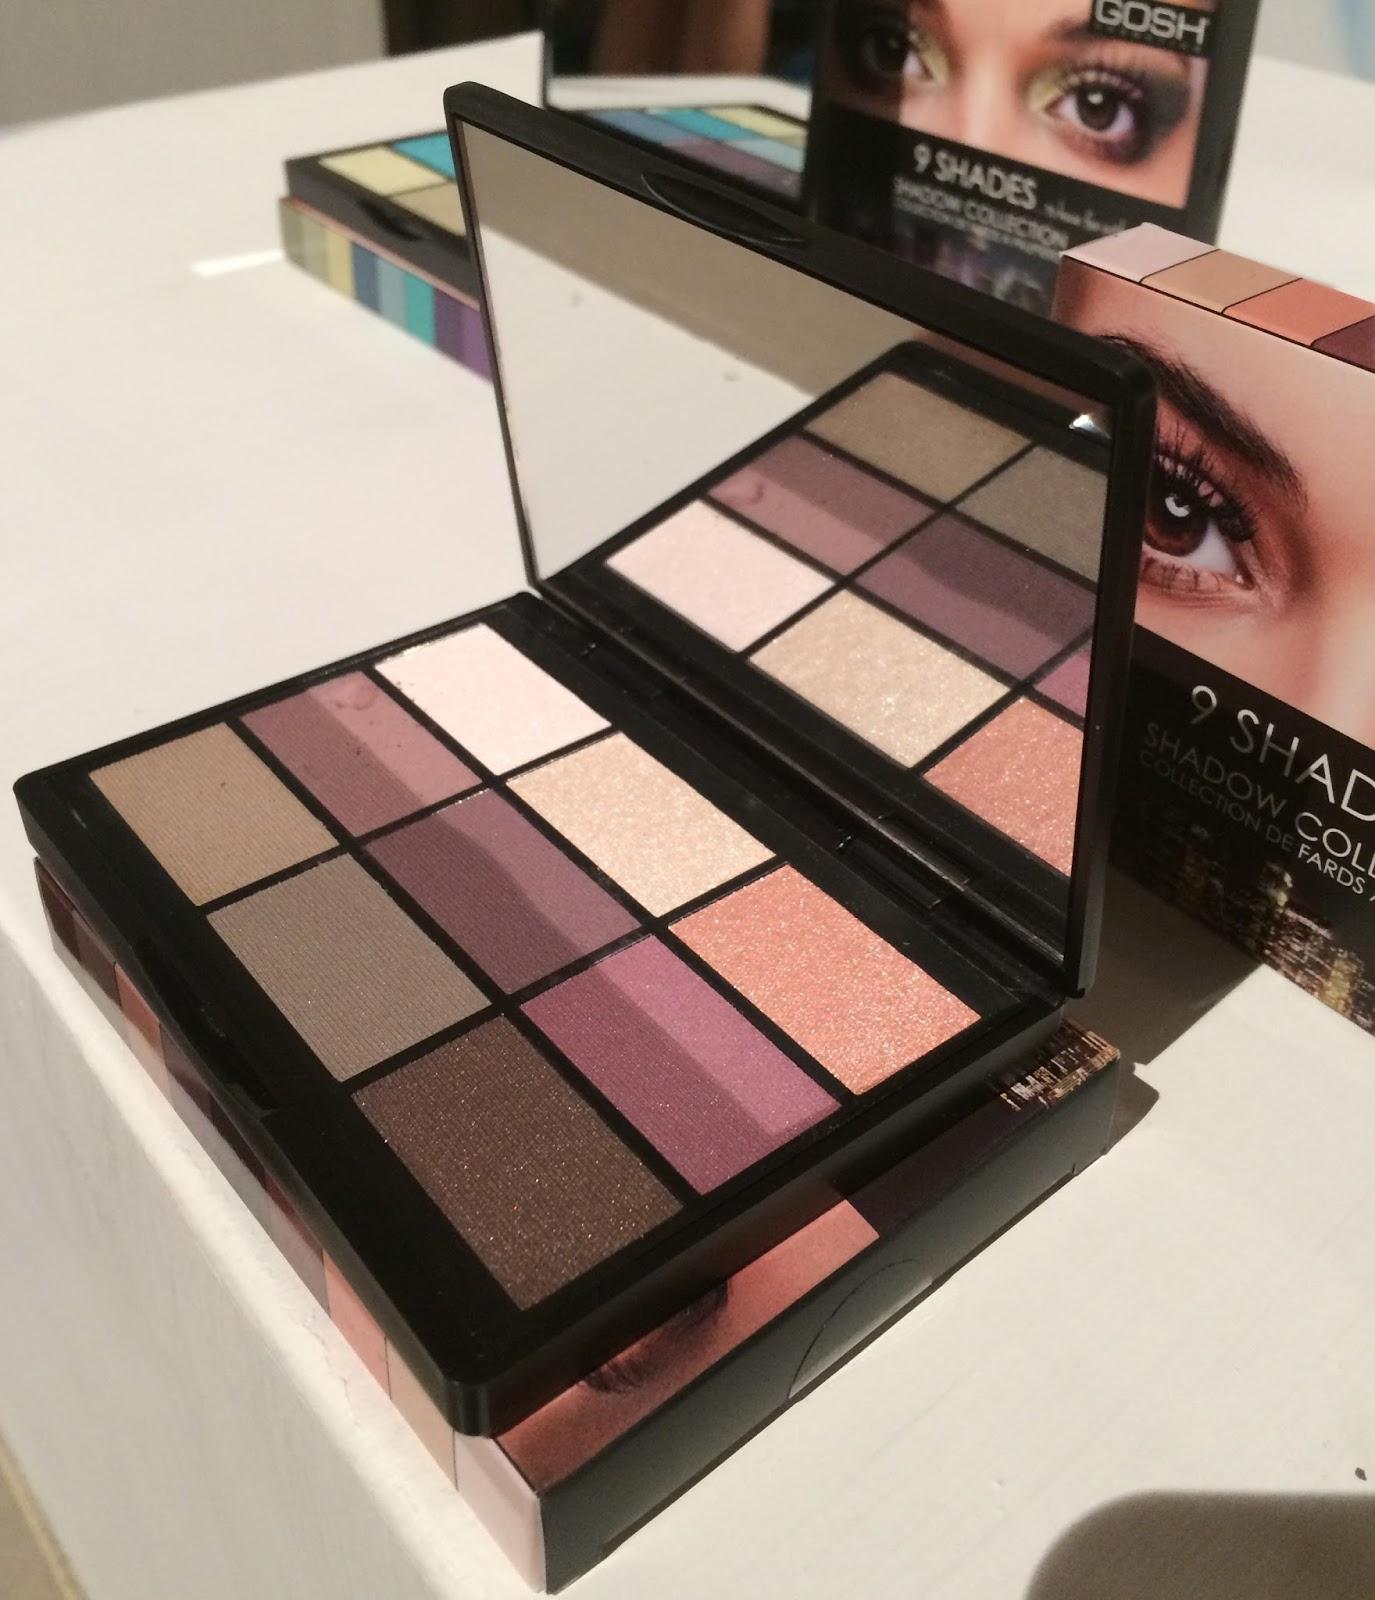 gosh-cosmetics-autumn-winter-2014-shades-eye-palette-to-enjoy-in-new-york